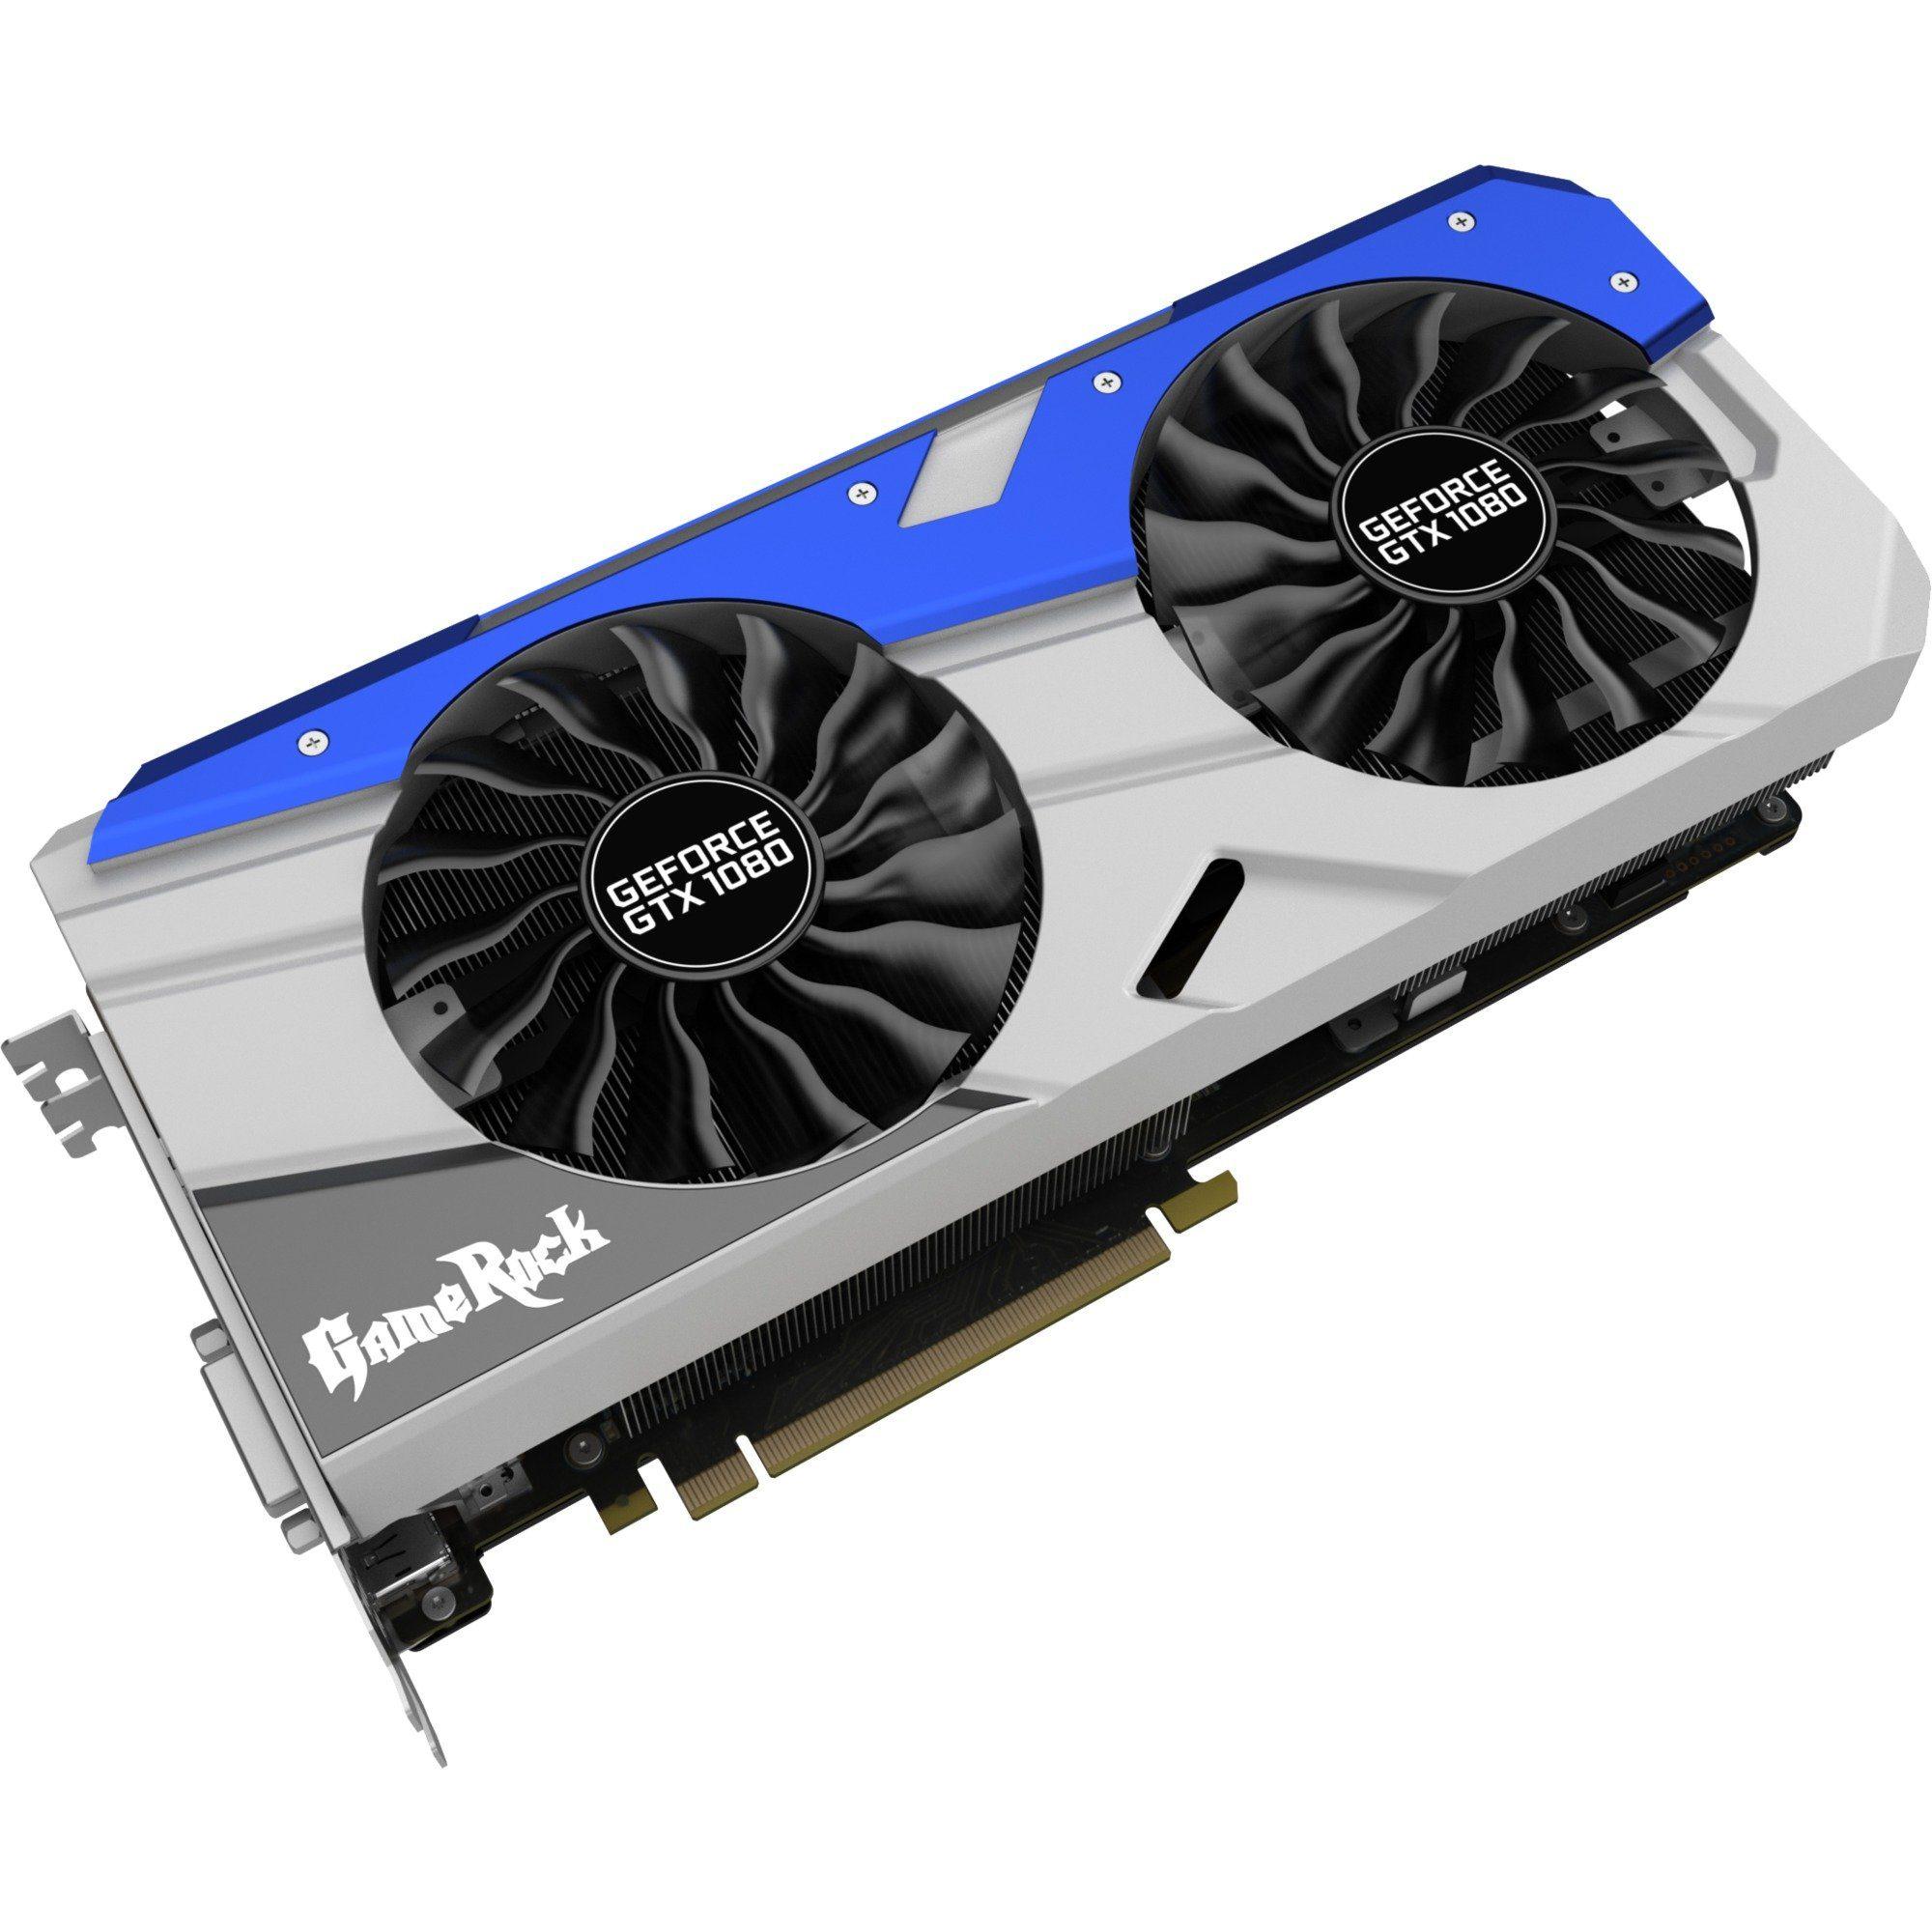 Palit Grafikkarte »GeForce GTX 1080 Gamerock«